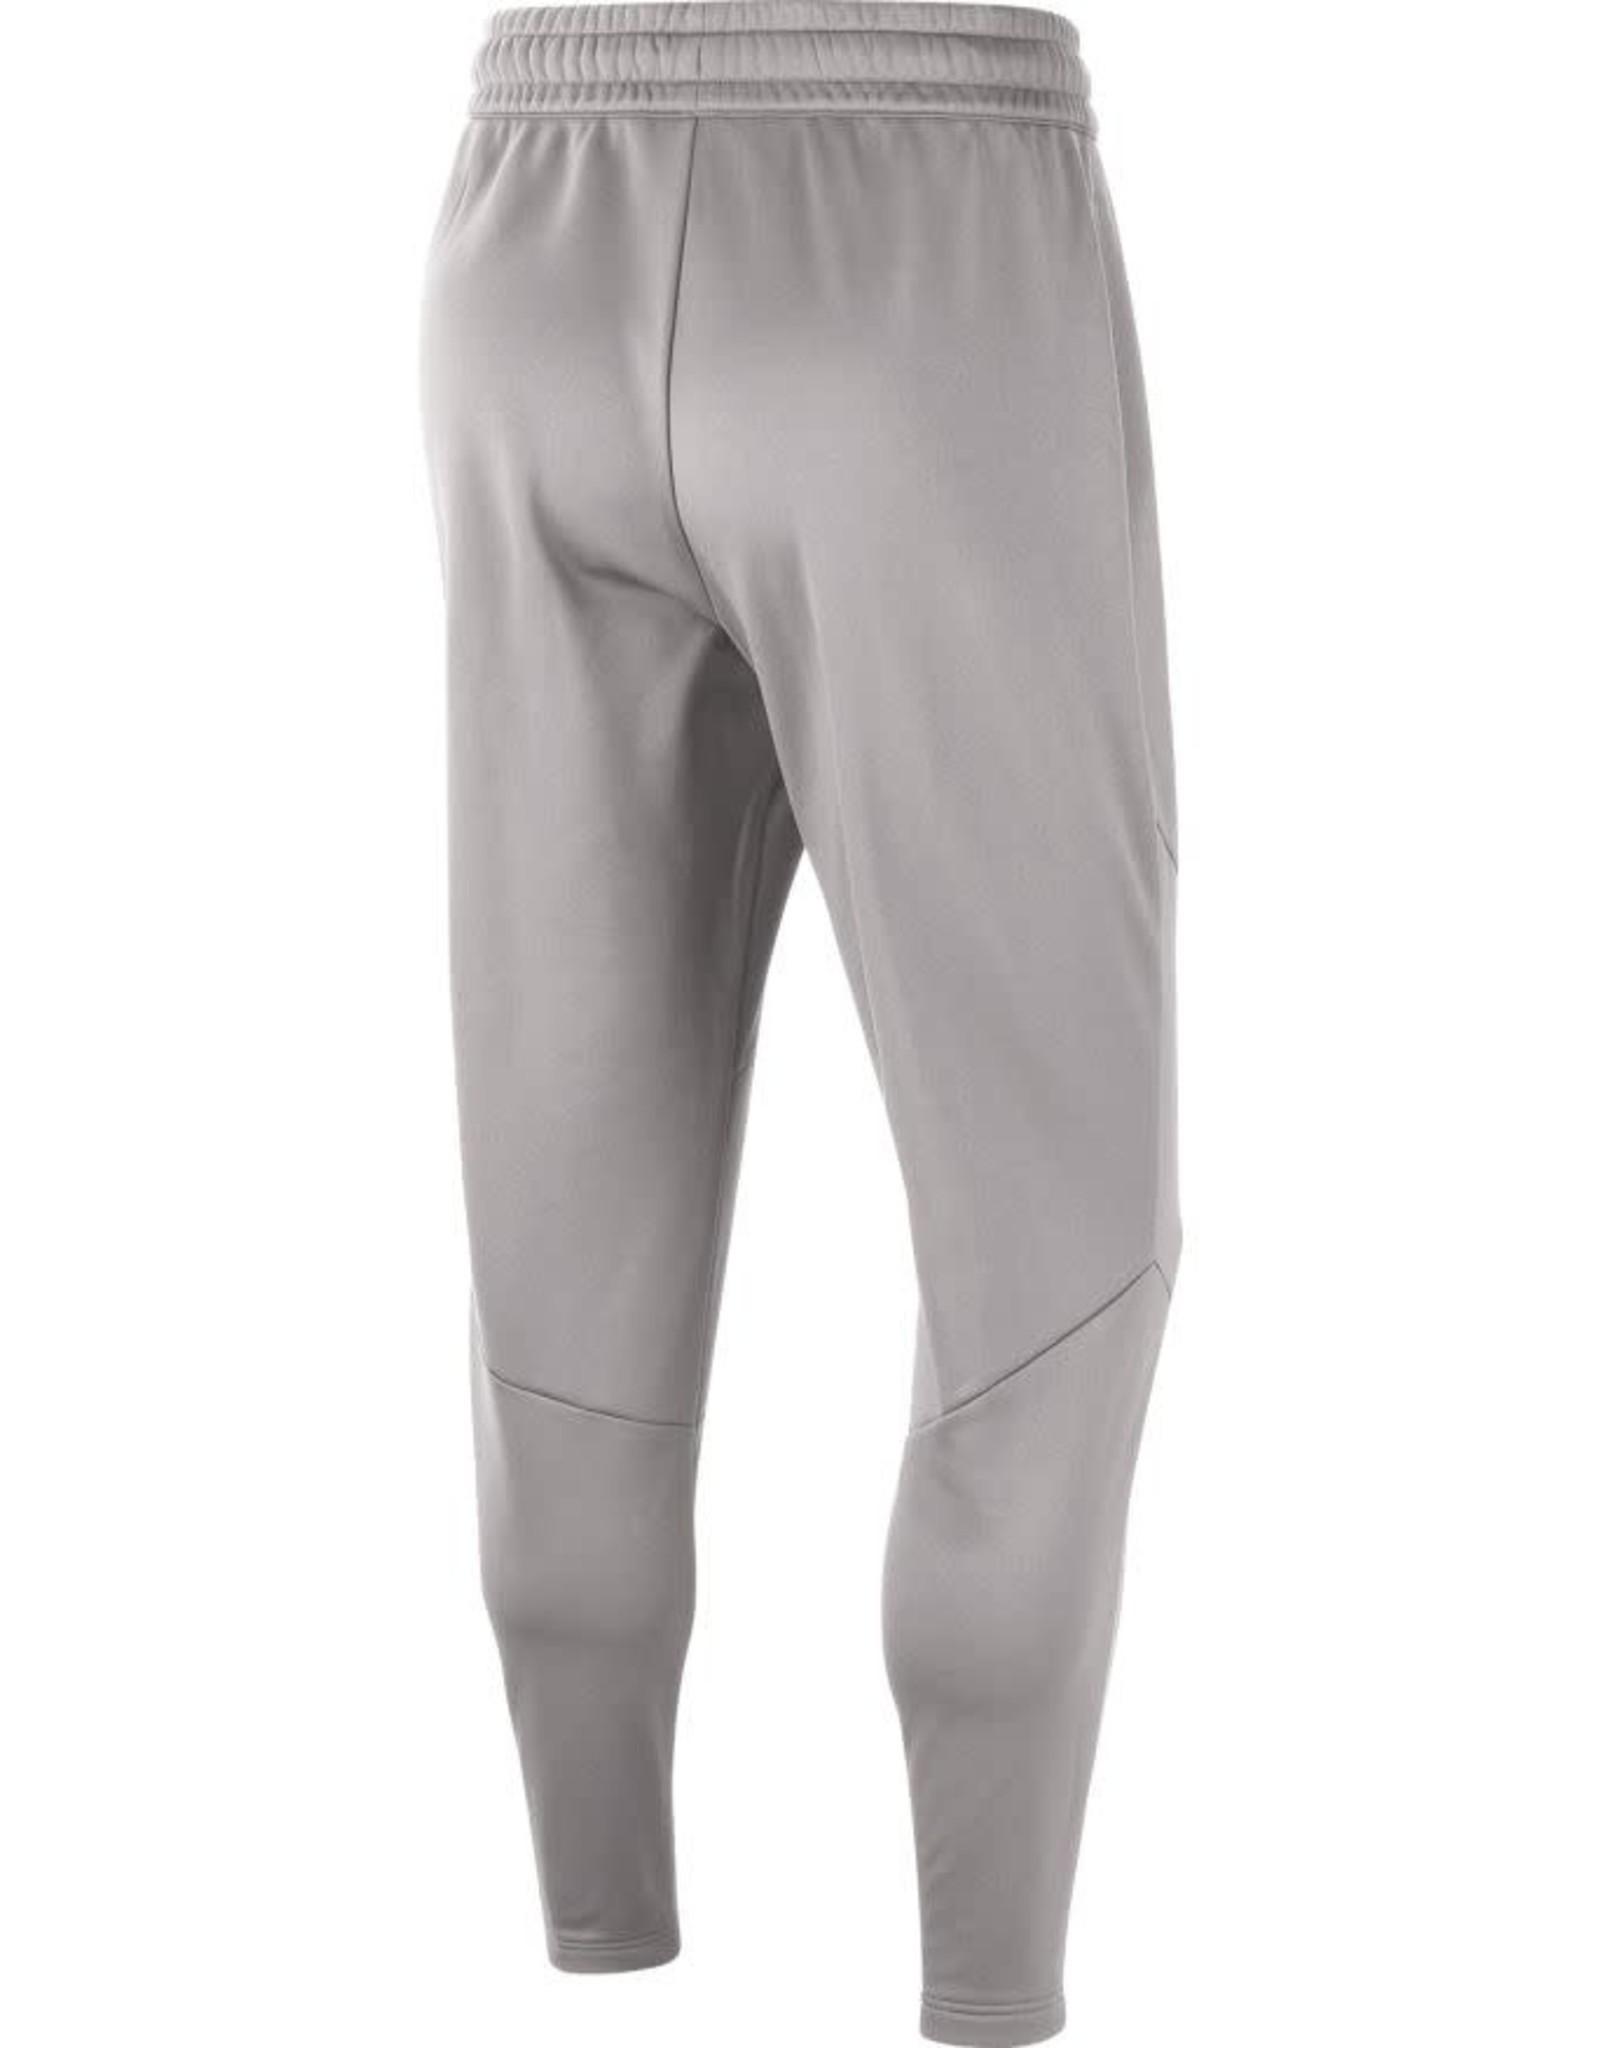 Jordan Jordan Brand Men's OU Practice Fleece Sweatpant